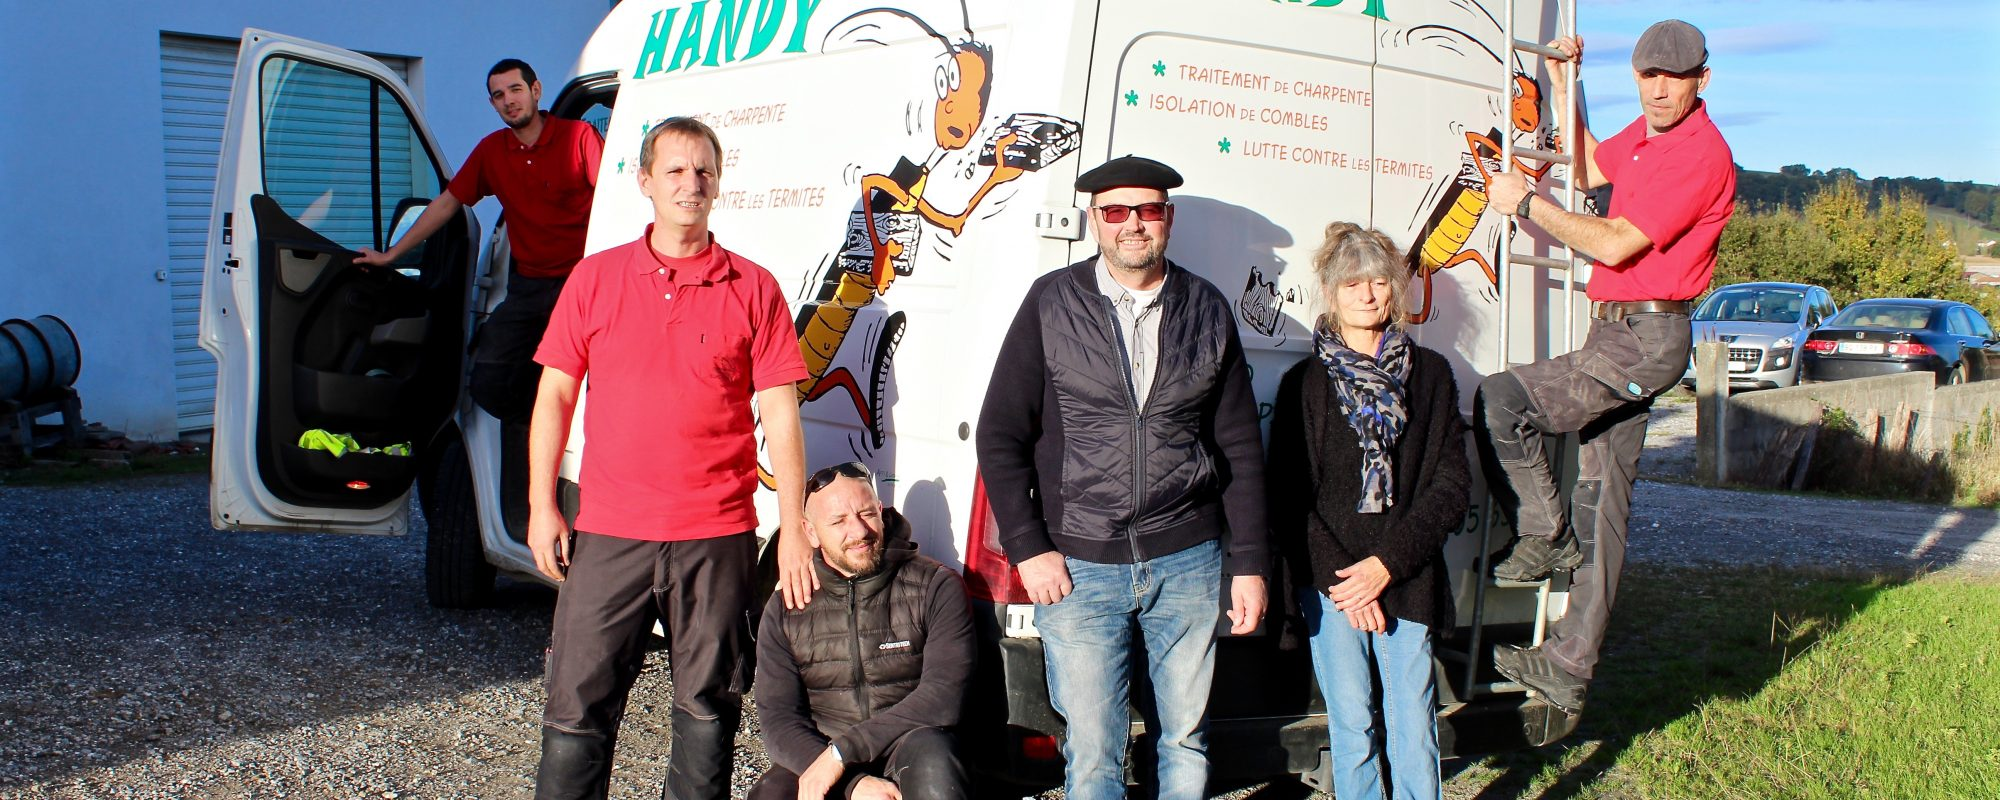 Equipe - Handy Germain - Traitement Termites - Pays Basque - Landes